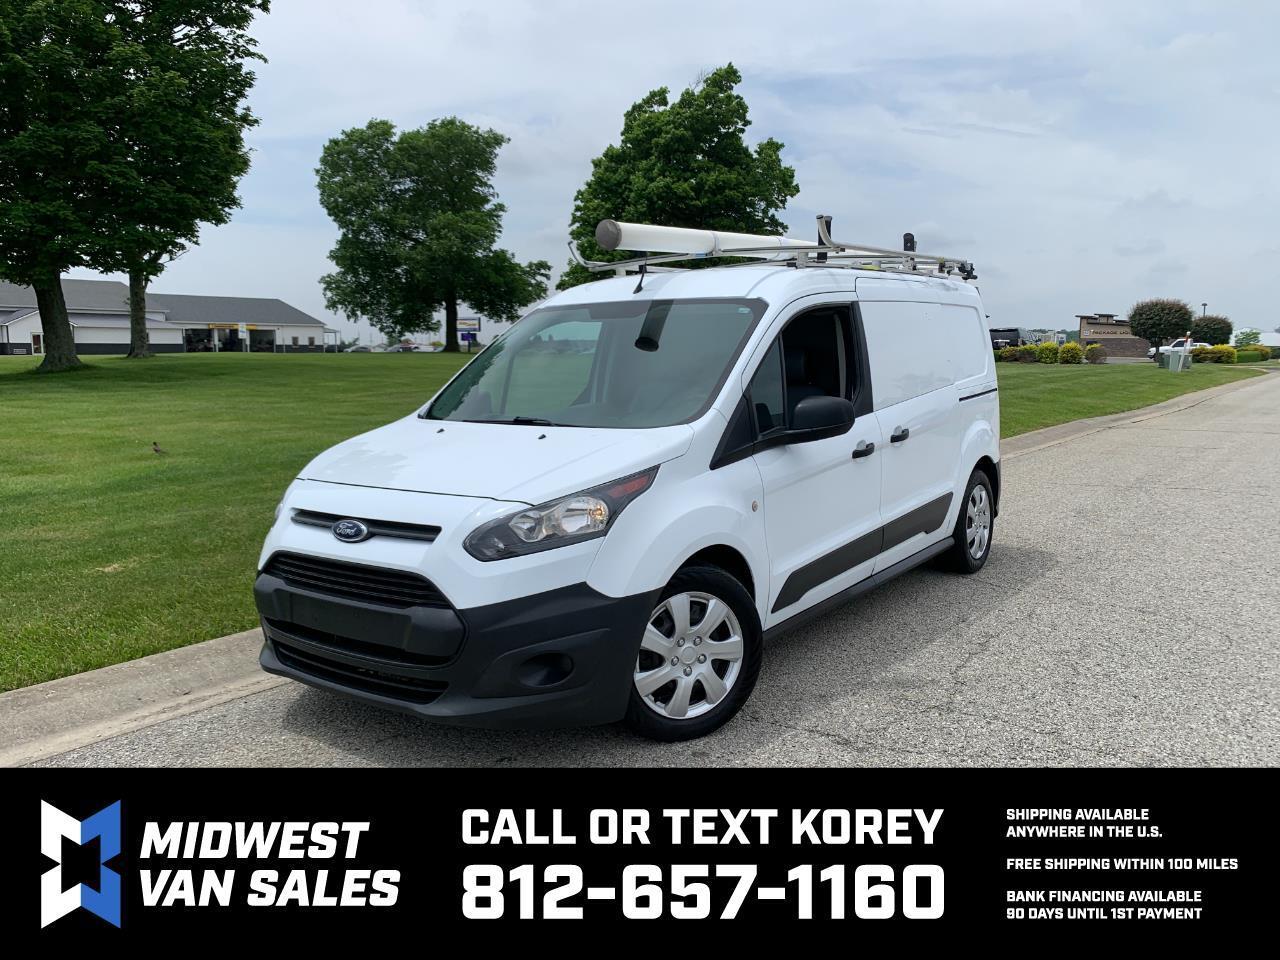 Ford Transit Connect Cargo Van XL LWB w/Rear 180 Degree Door 2017